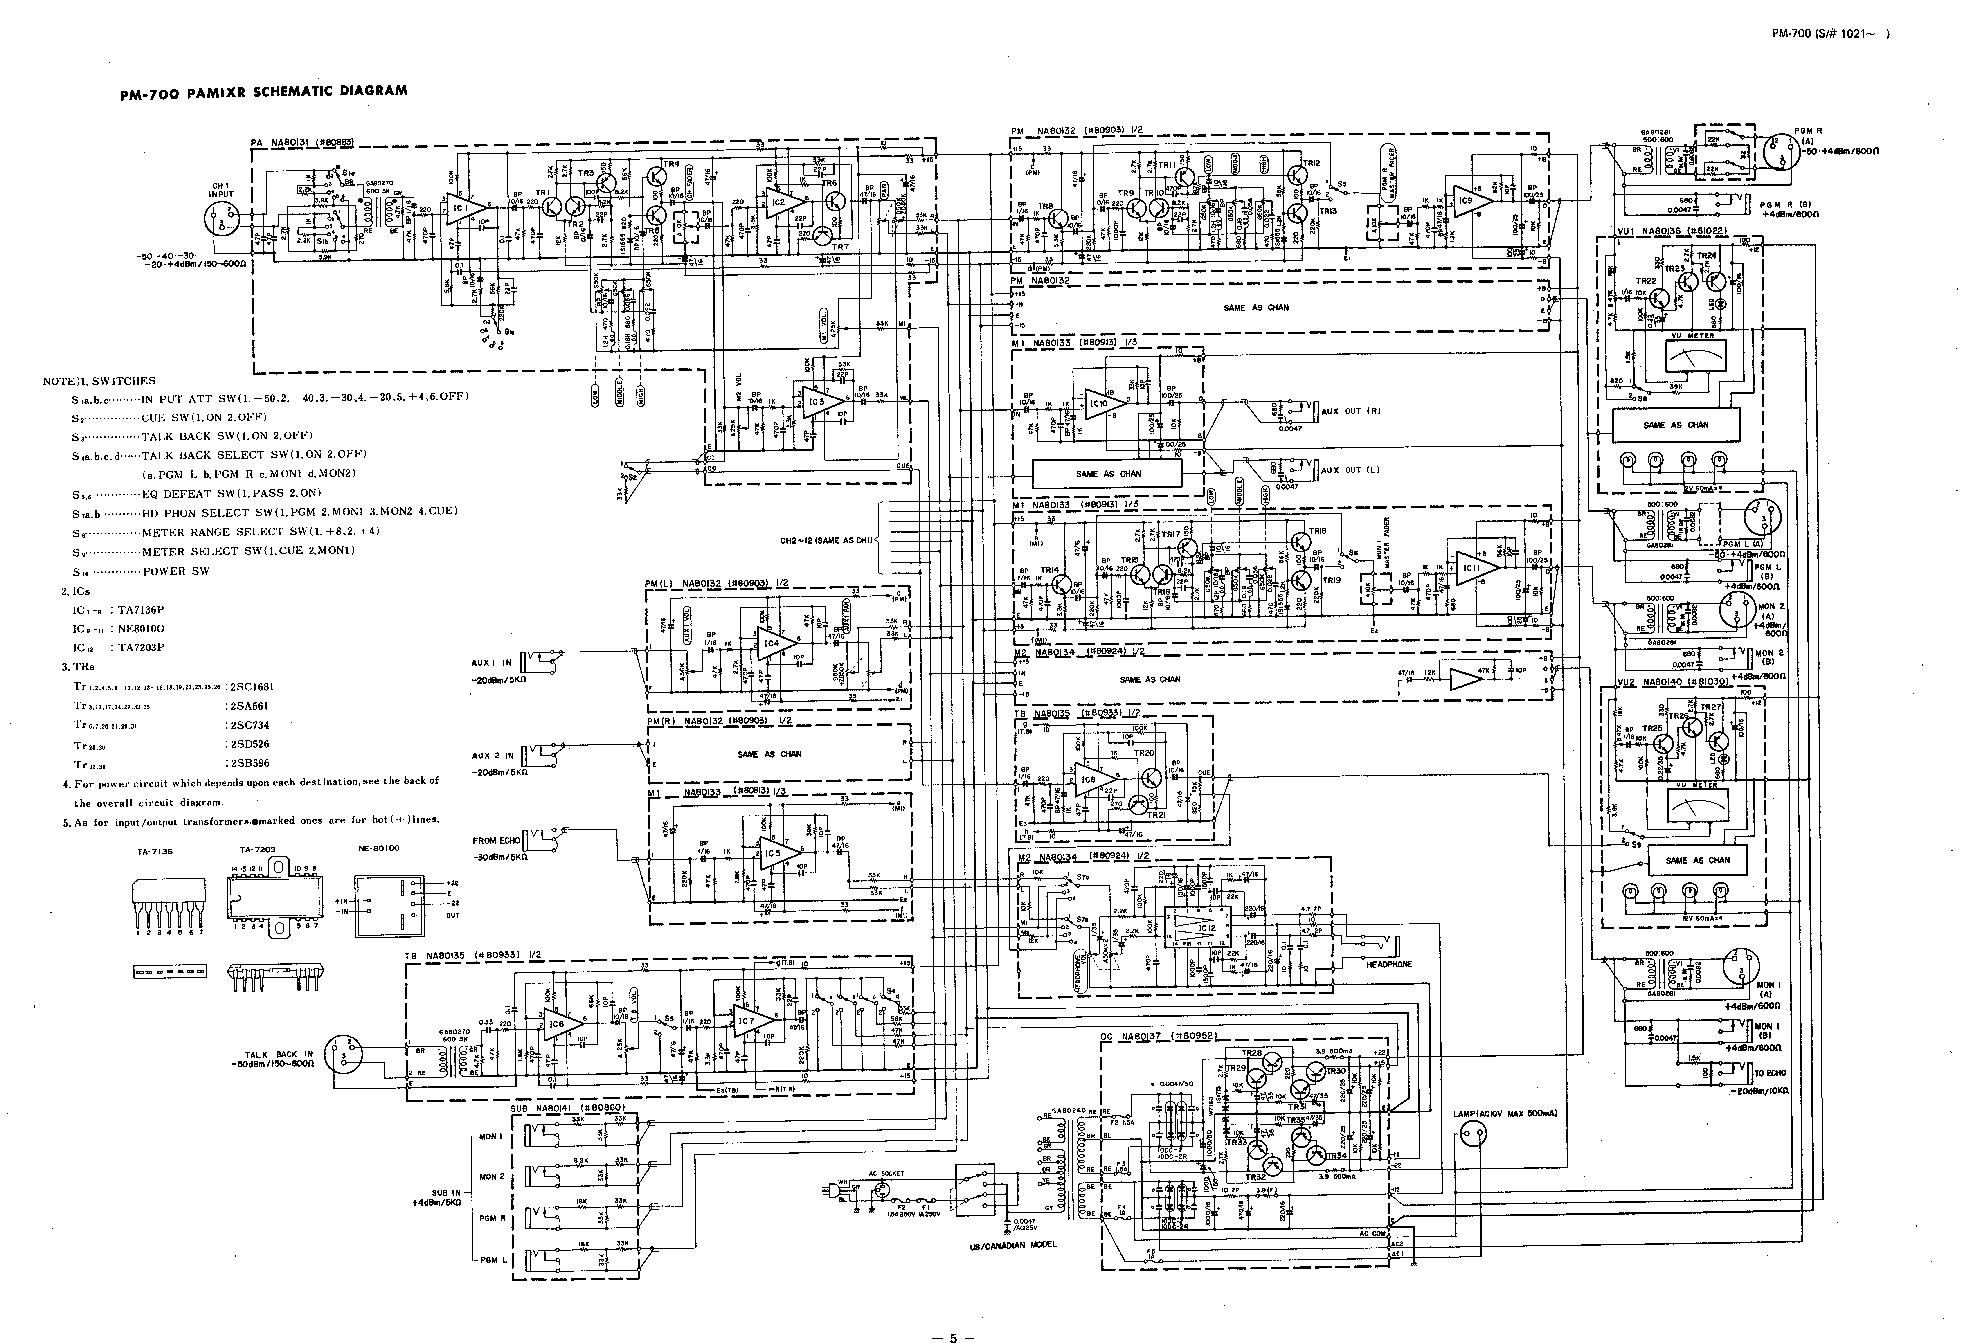 Marvelous Yamaha Pm 700 Audio Mixer Sch Service Manual Download Schematics Wiring Digital Resources Hutpapmognl